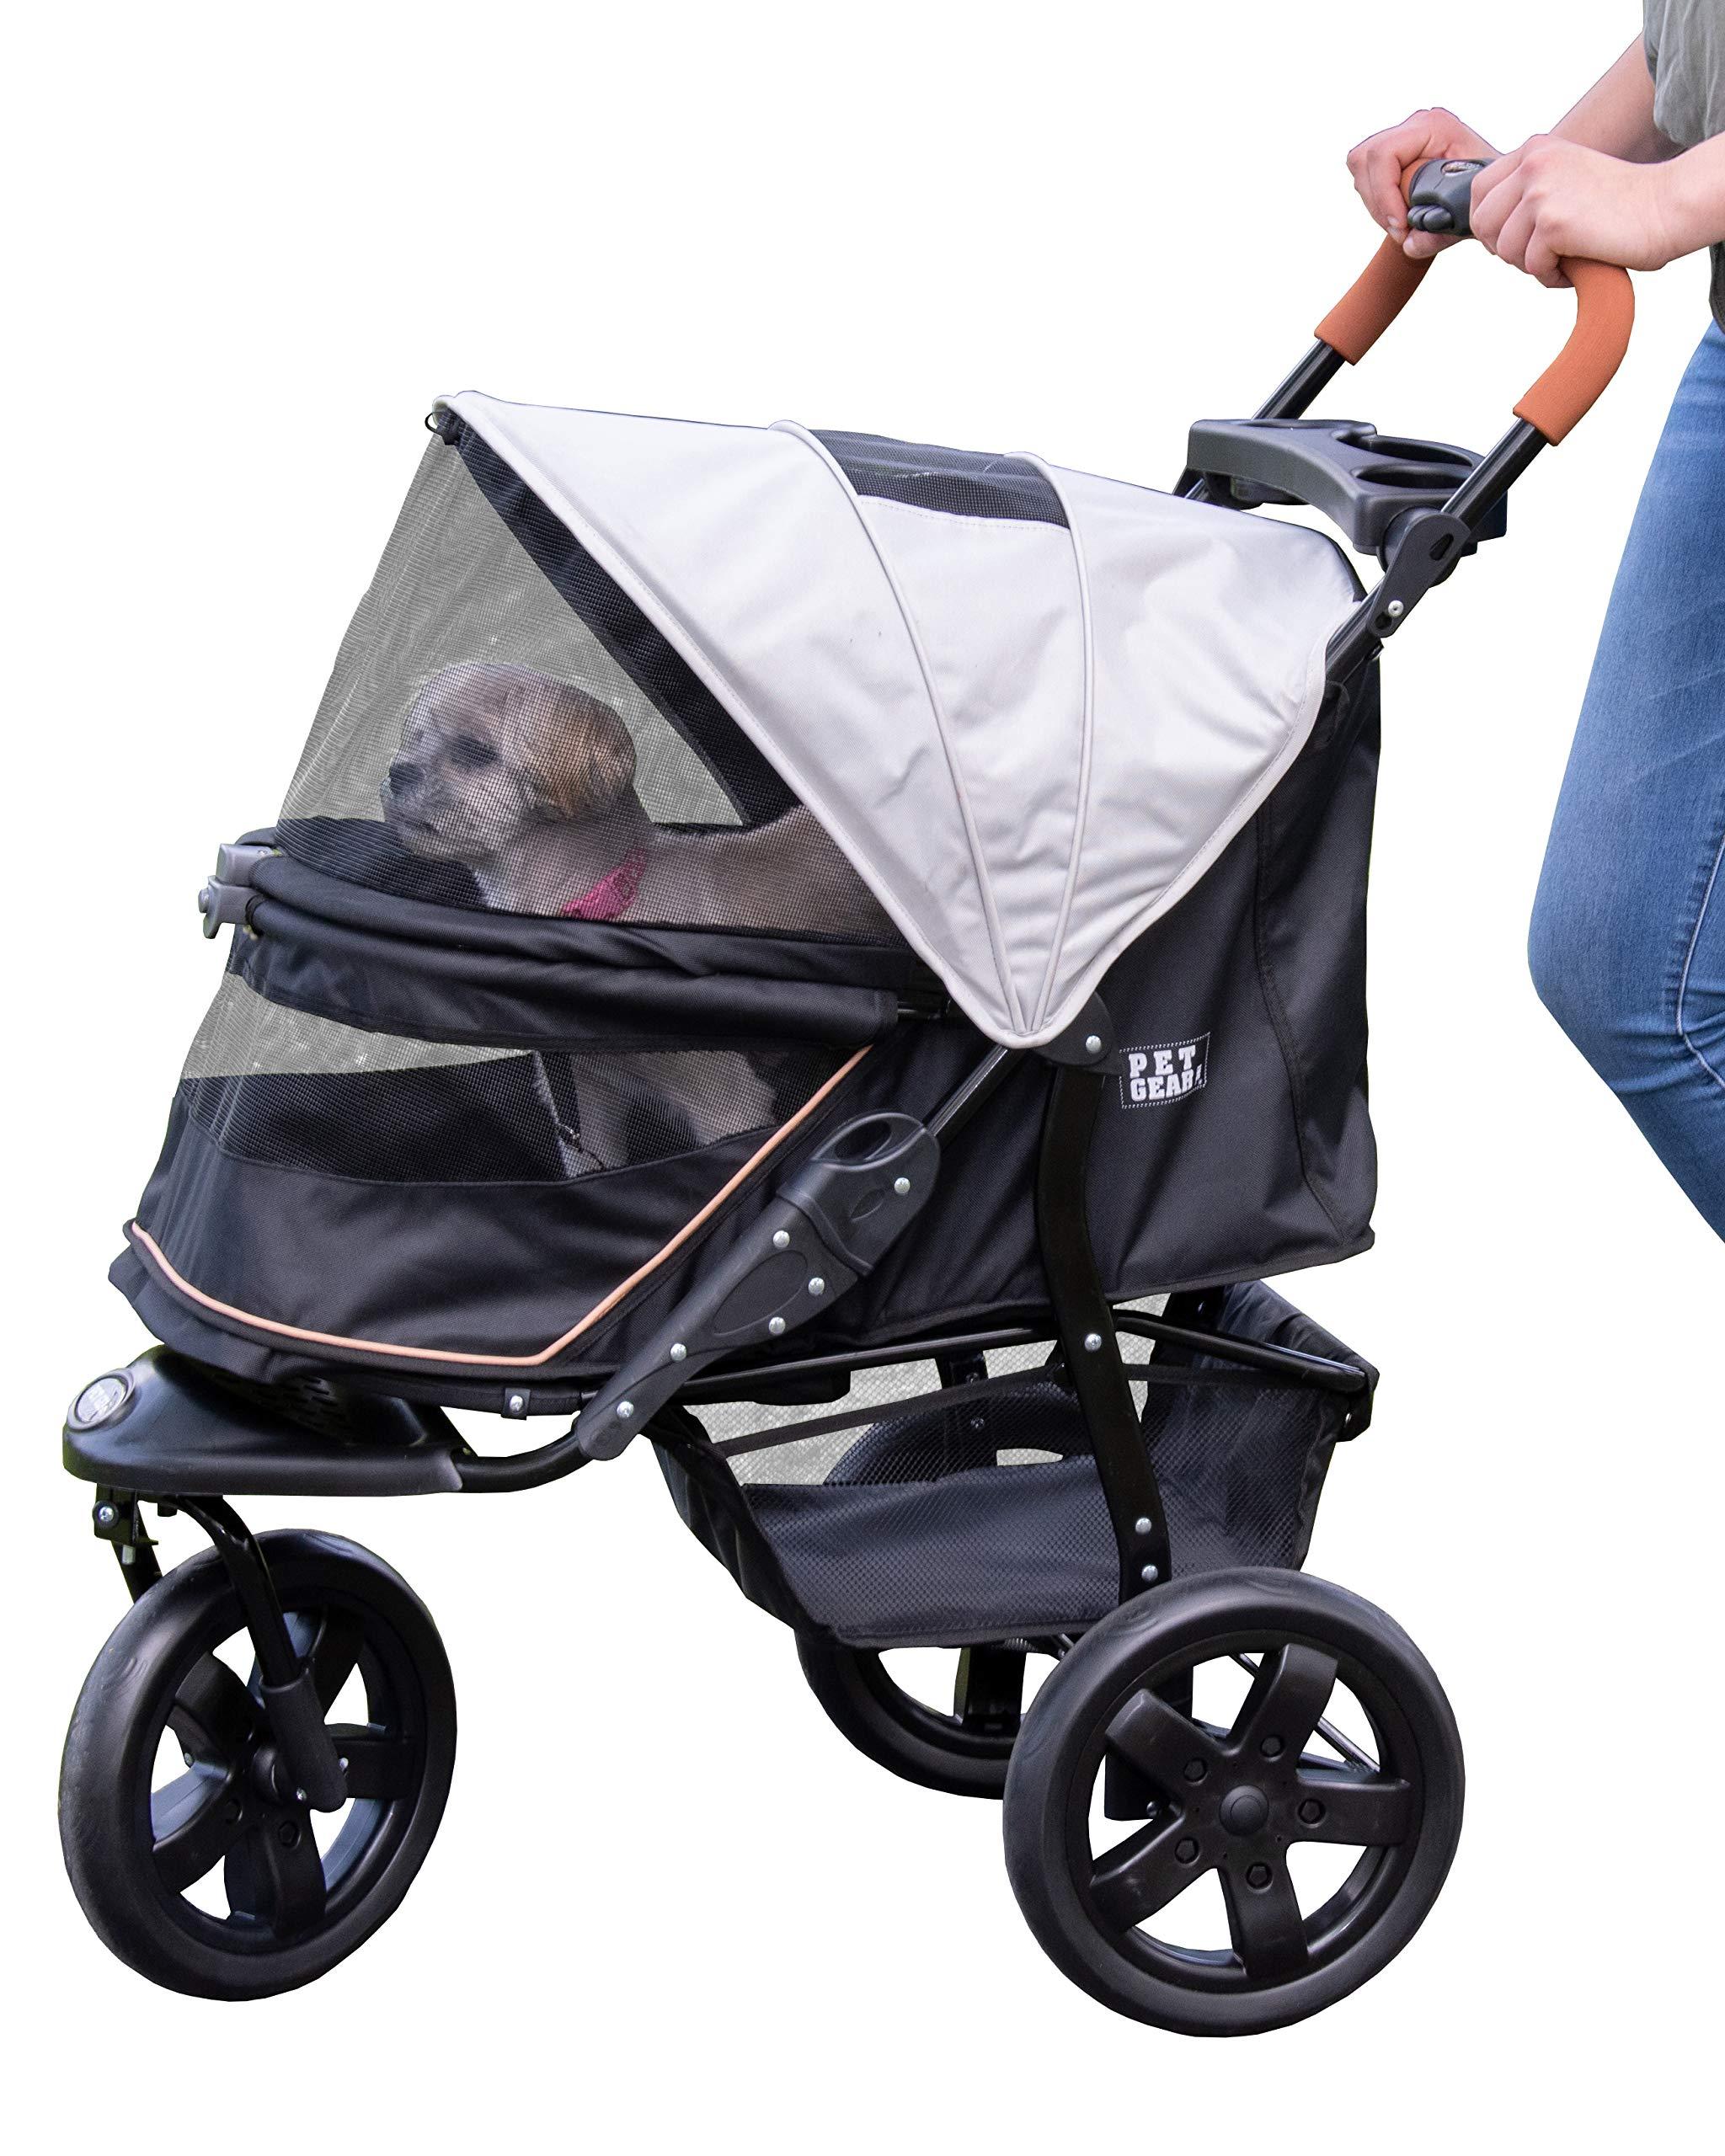 Pet Gear AT3 No-Zip Pet Stroller, Summit Grey by Pet Gear